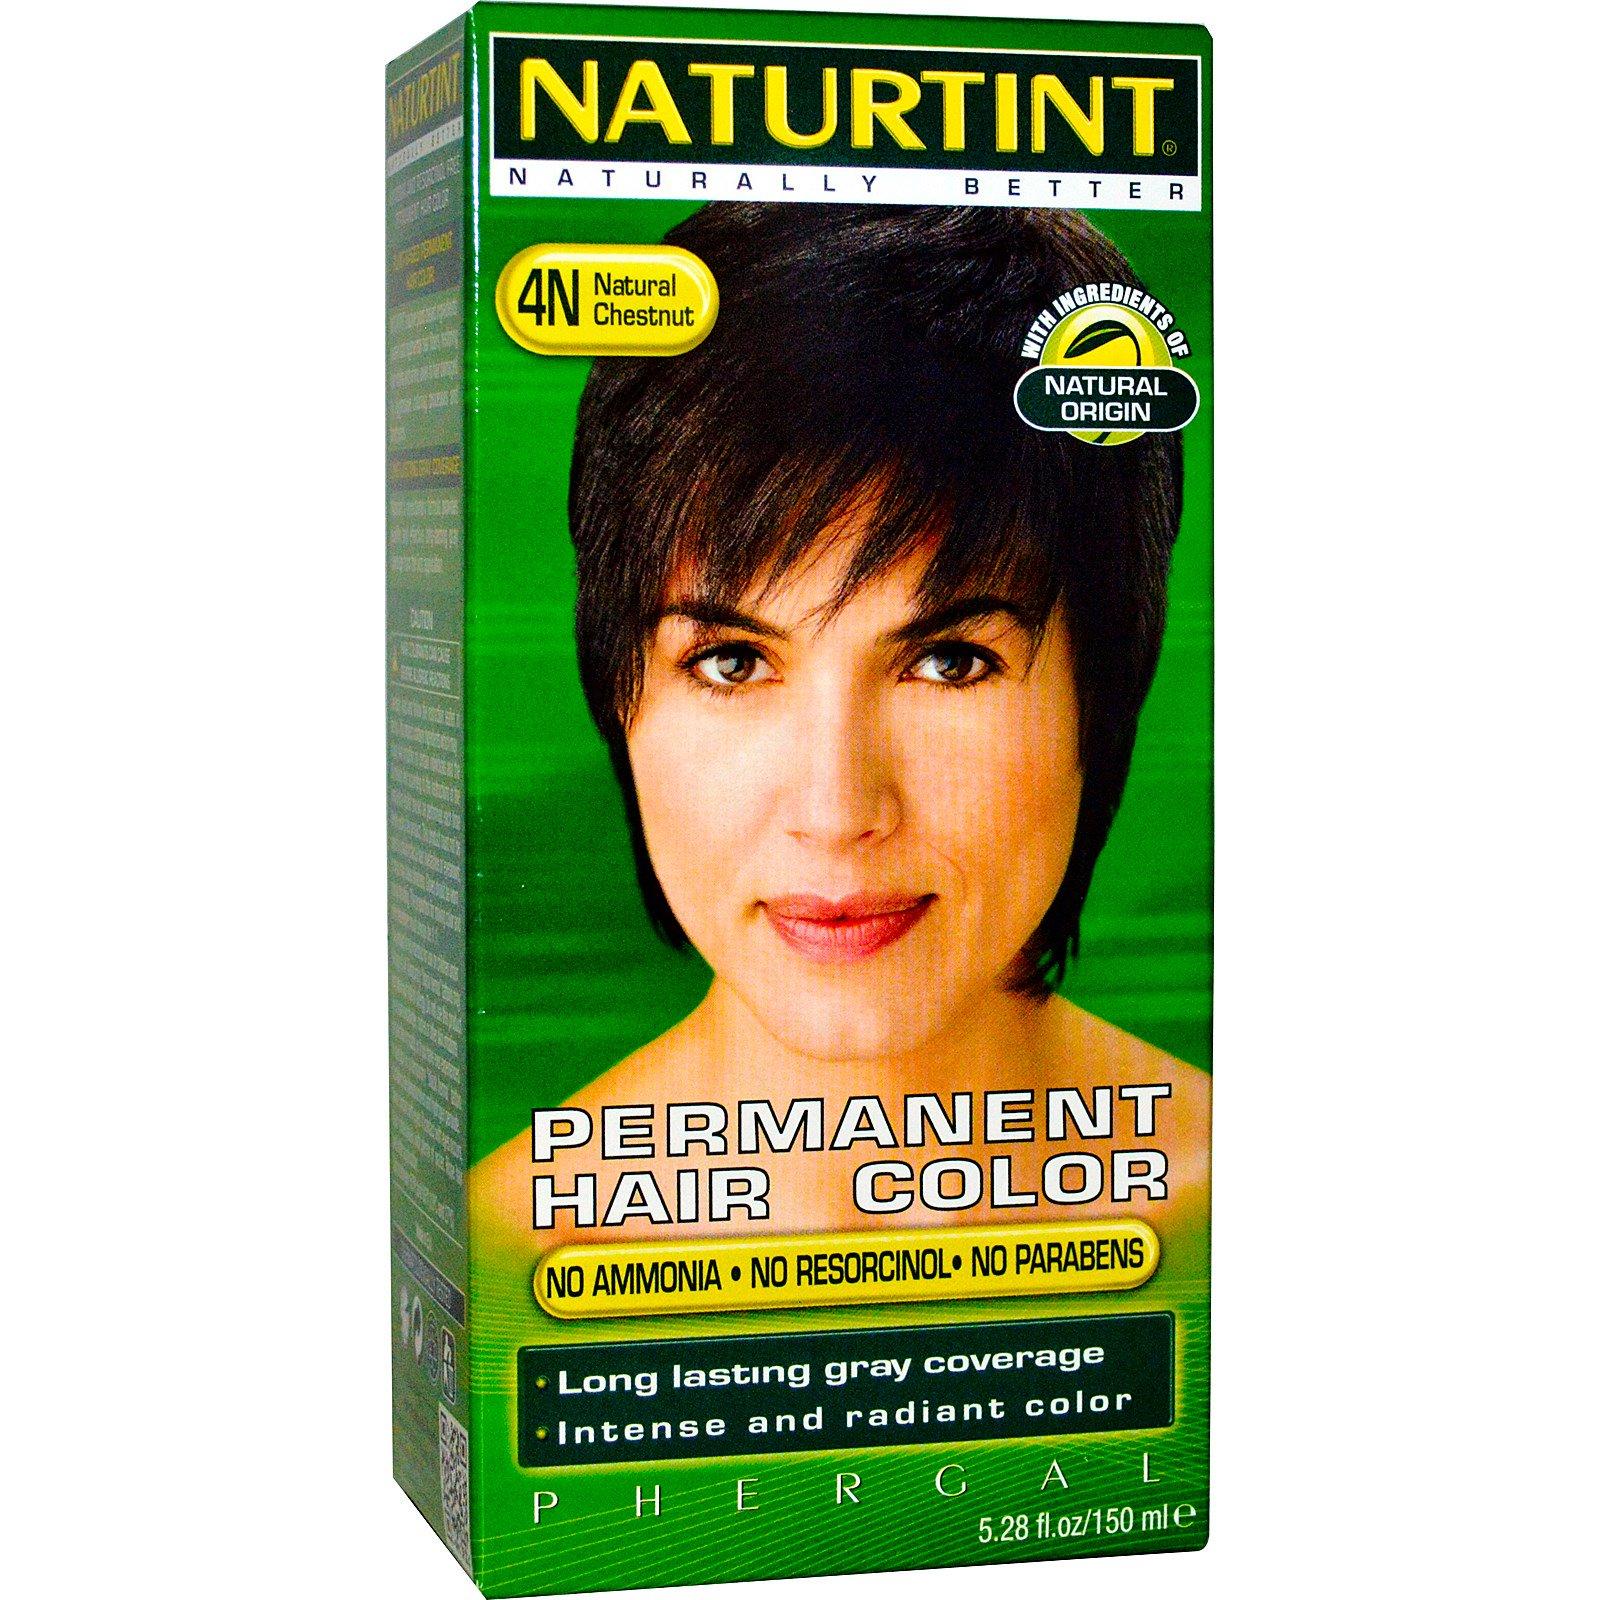 Naturtint Permanent Hair Color 4n Natural Chestnut 5 28 Fl Oz 150 Ml